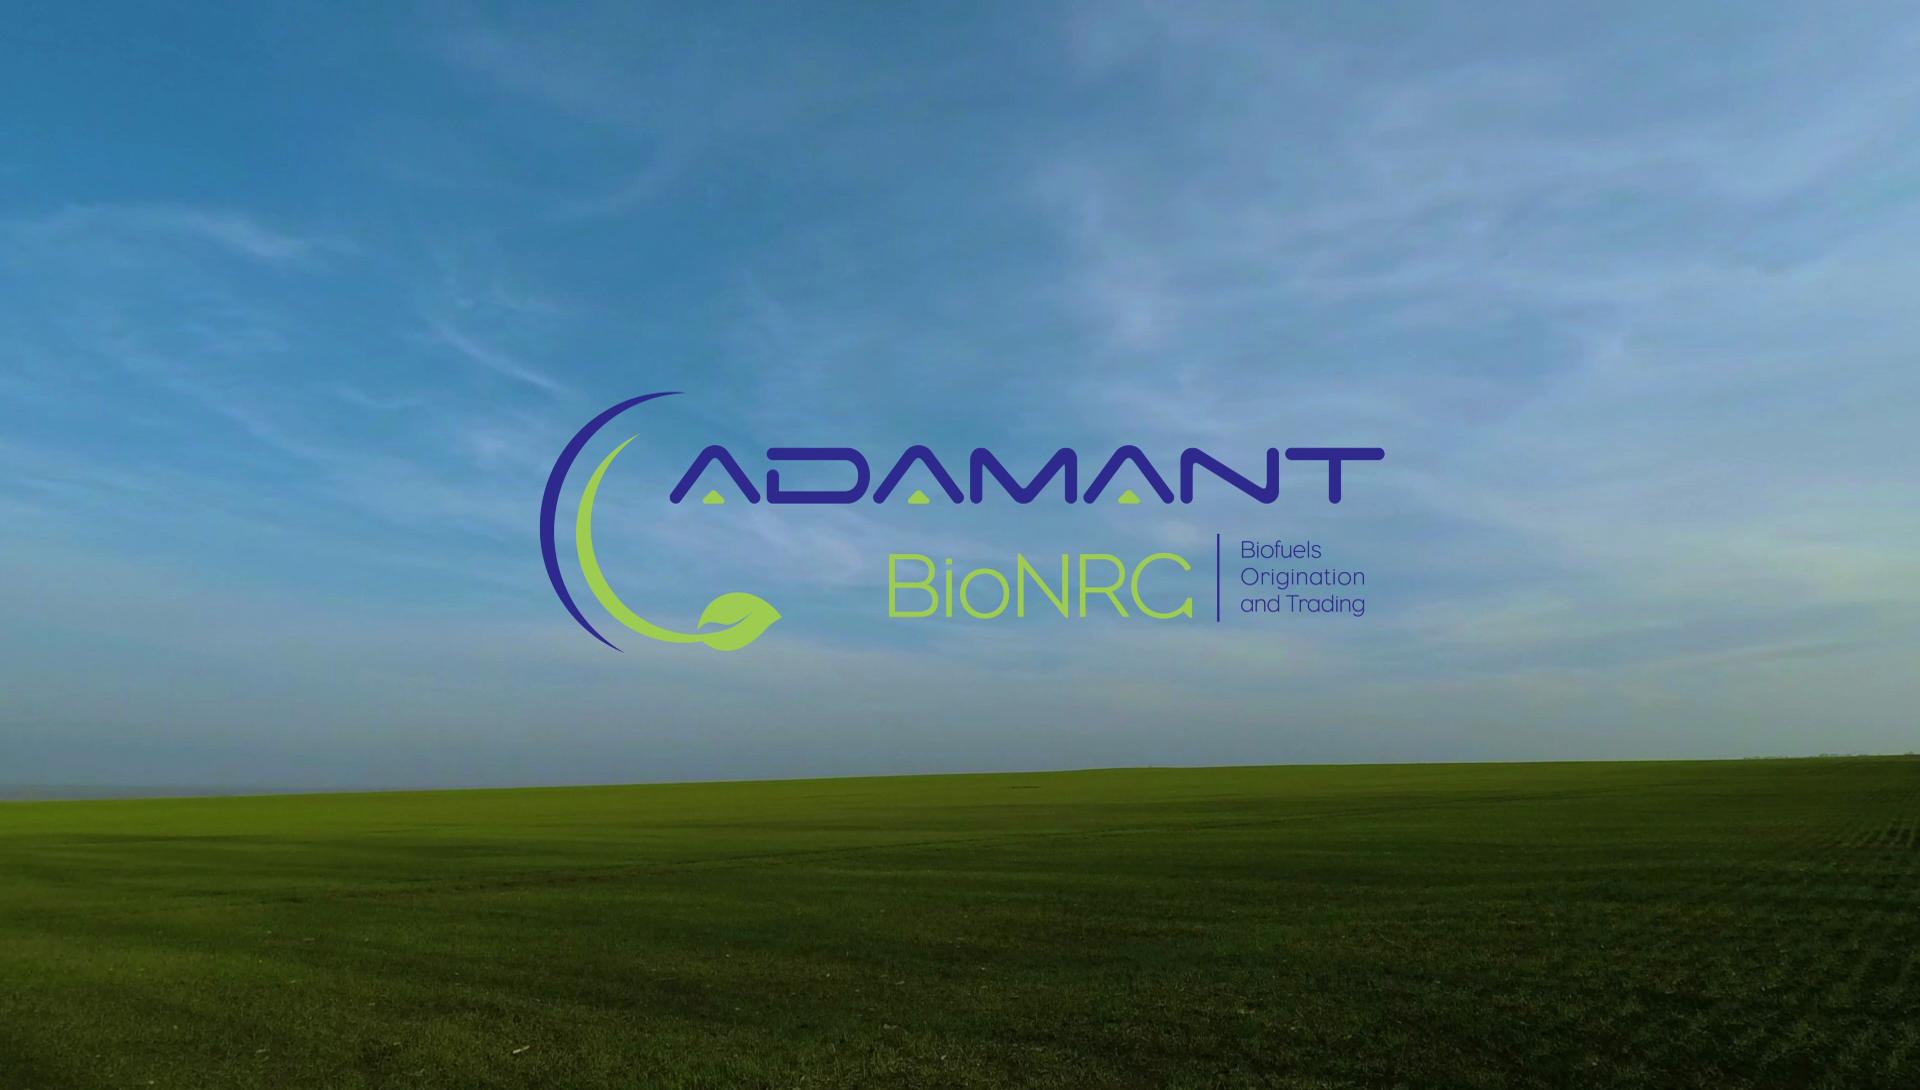 Football player kicking a ball with Adamant BioNRG Logo